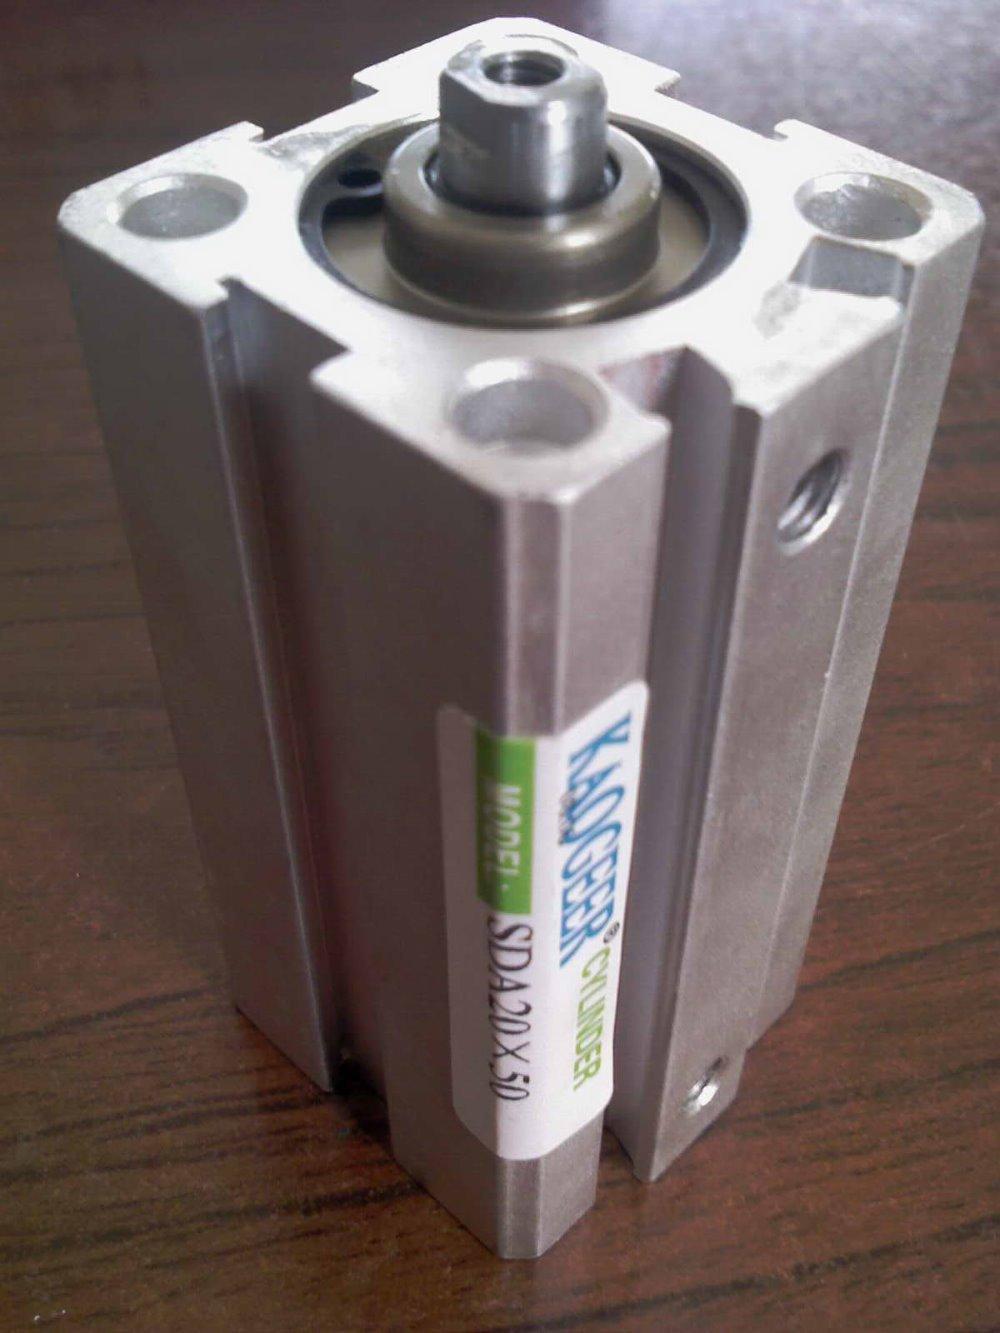 SDA Series compact Pneumatic Cylinder / air cylinder SDA16X60 SDA16X70 SDA16X80 SDA16X90 SDA16X100 б у шины 235 70 16 или 245 70 16 только в г воронеже